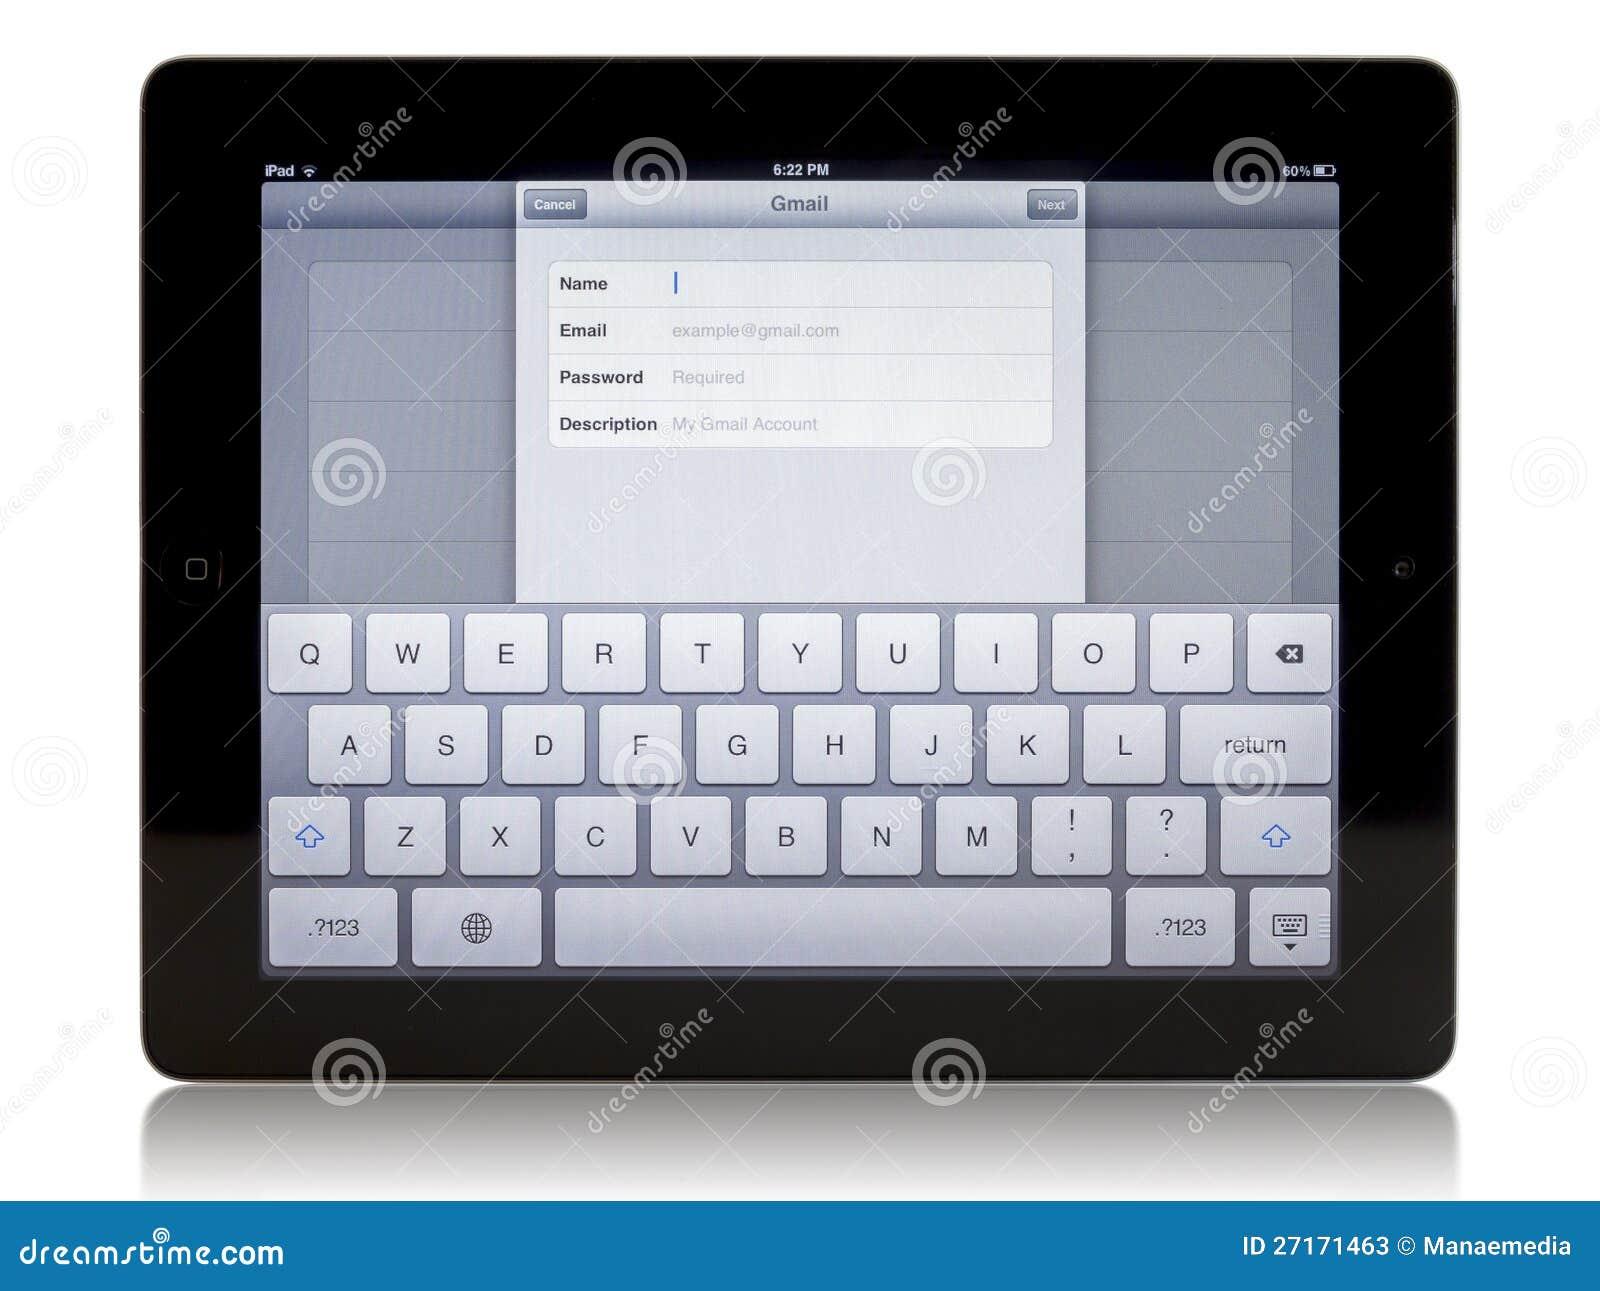 Ipad 3 med Gmail anslutning